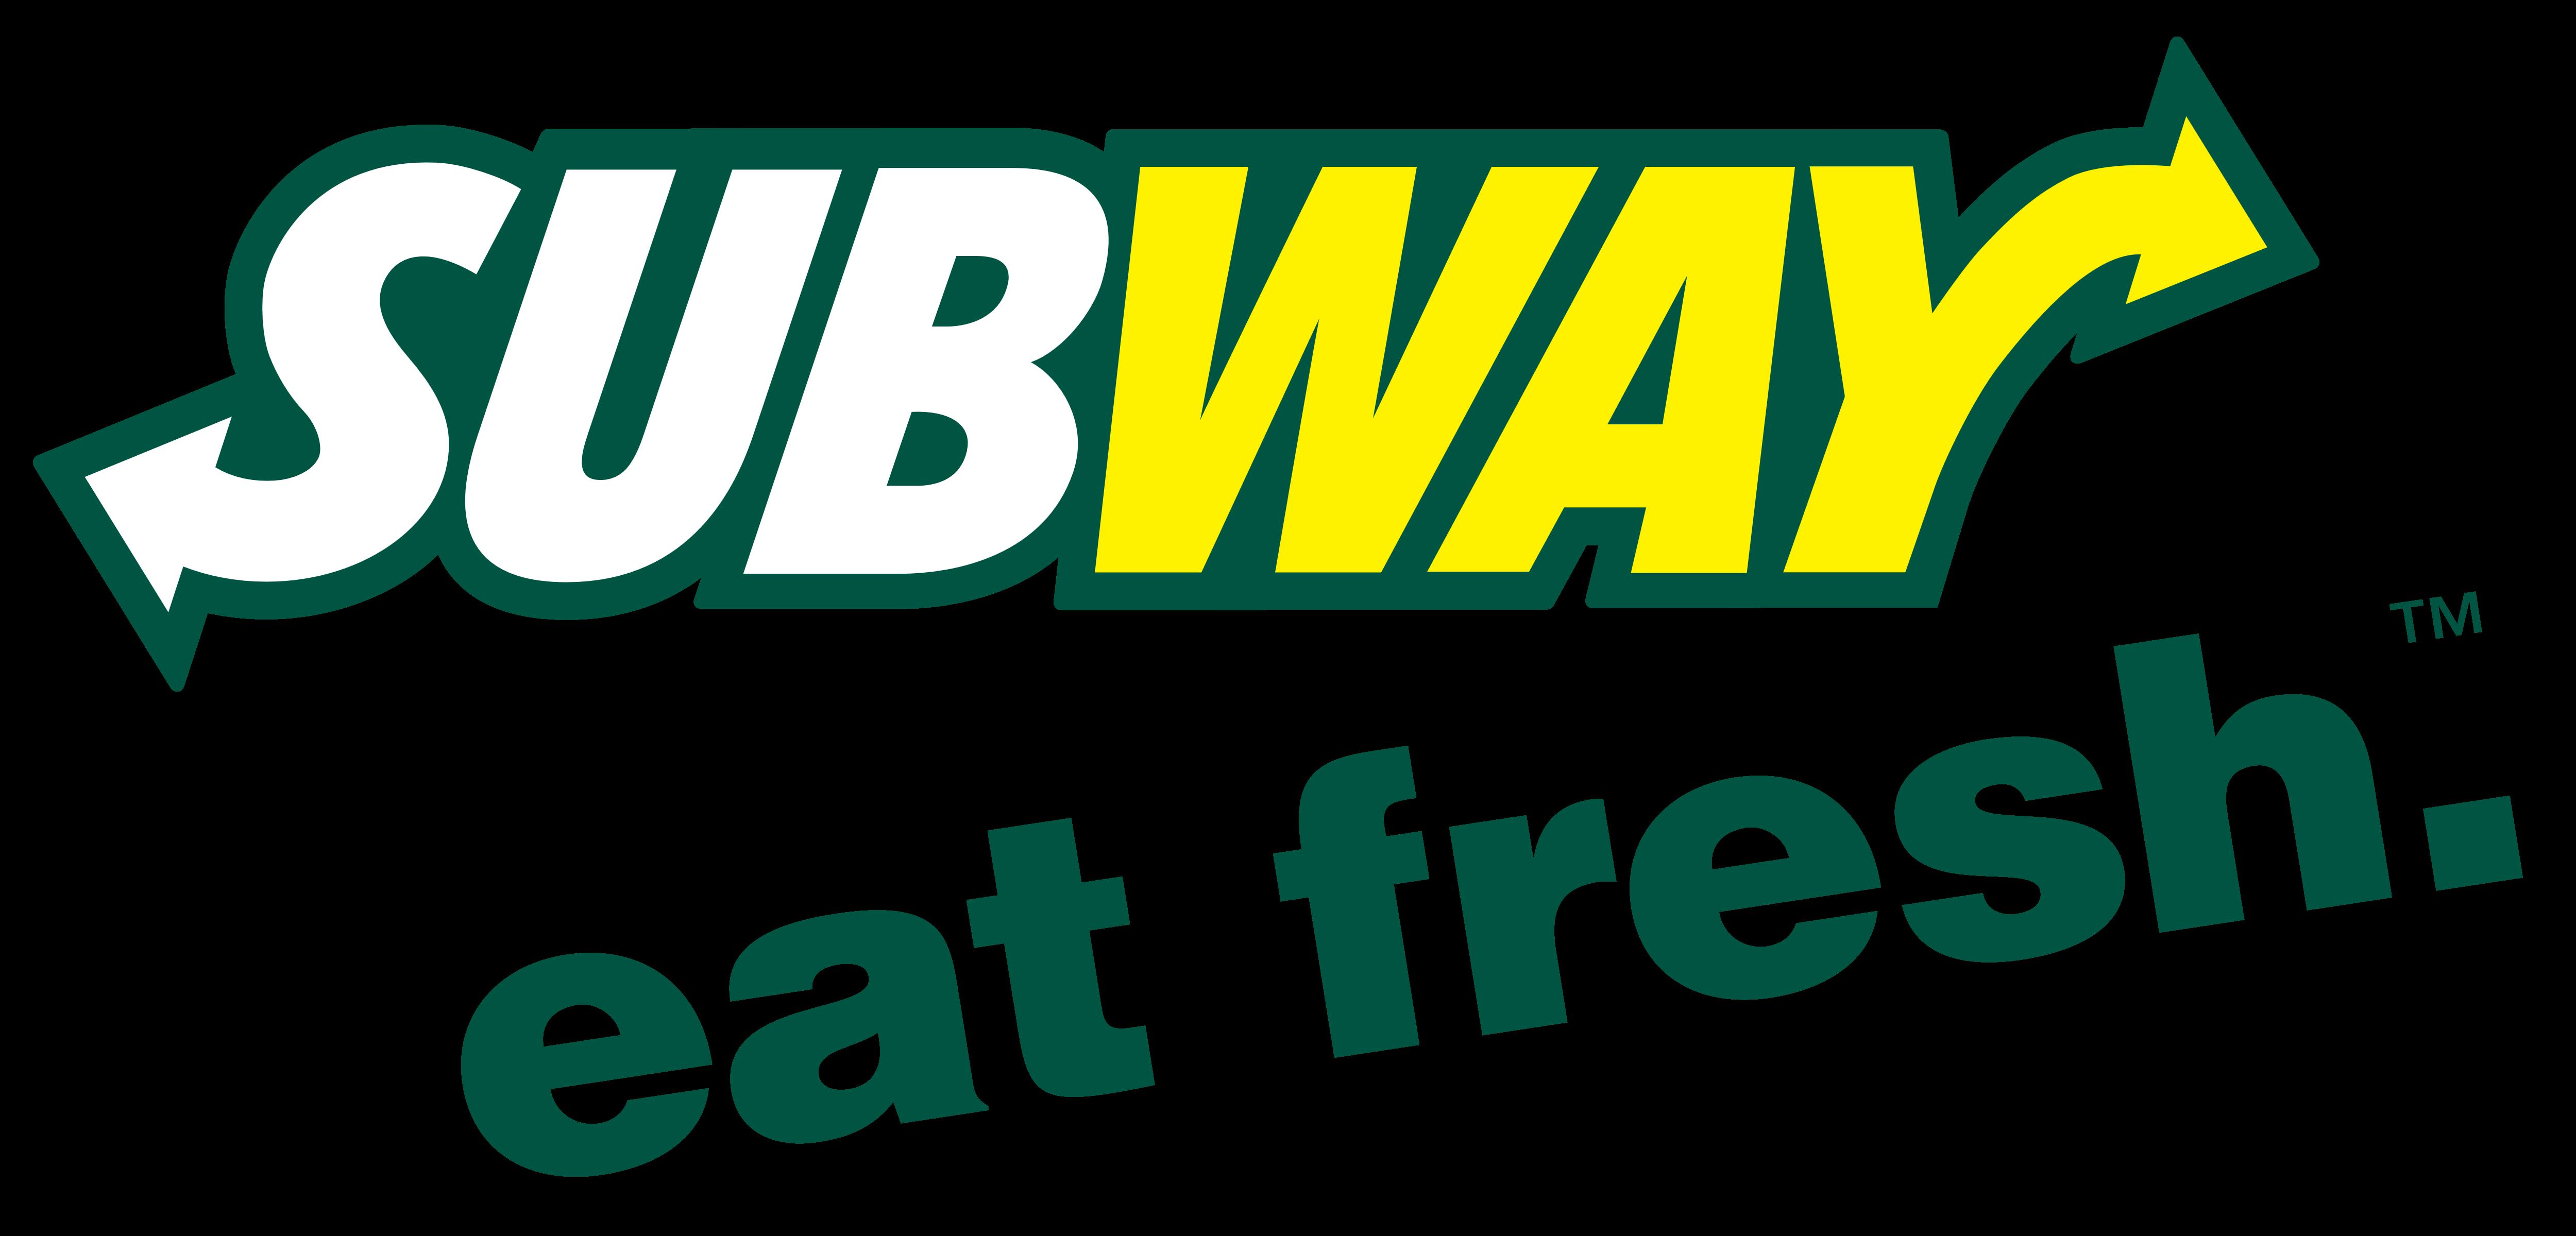 Subway Restaurant logo with slogan - Eat Fresh